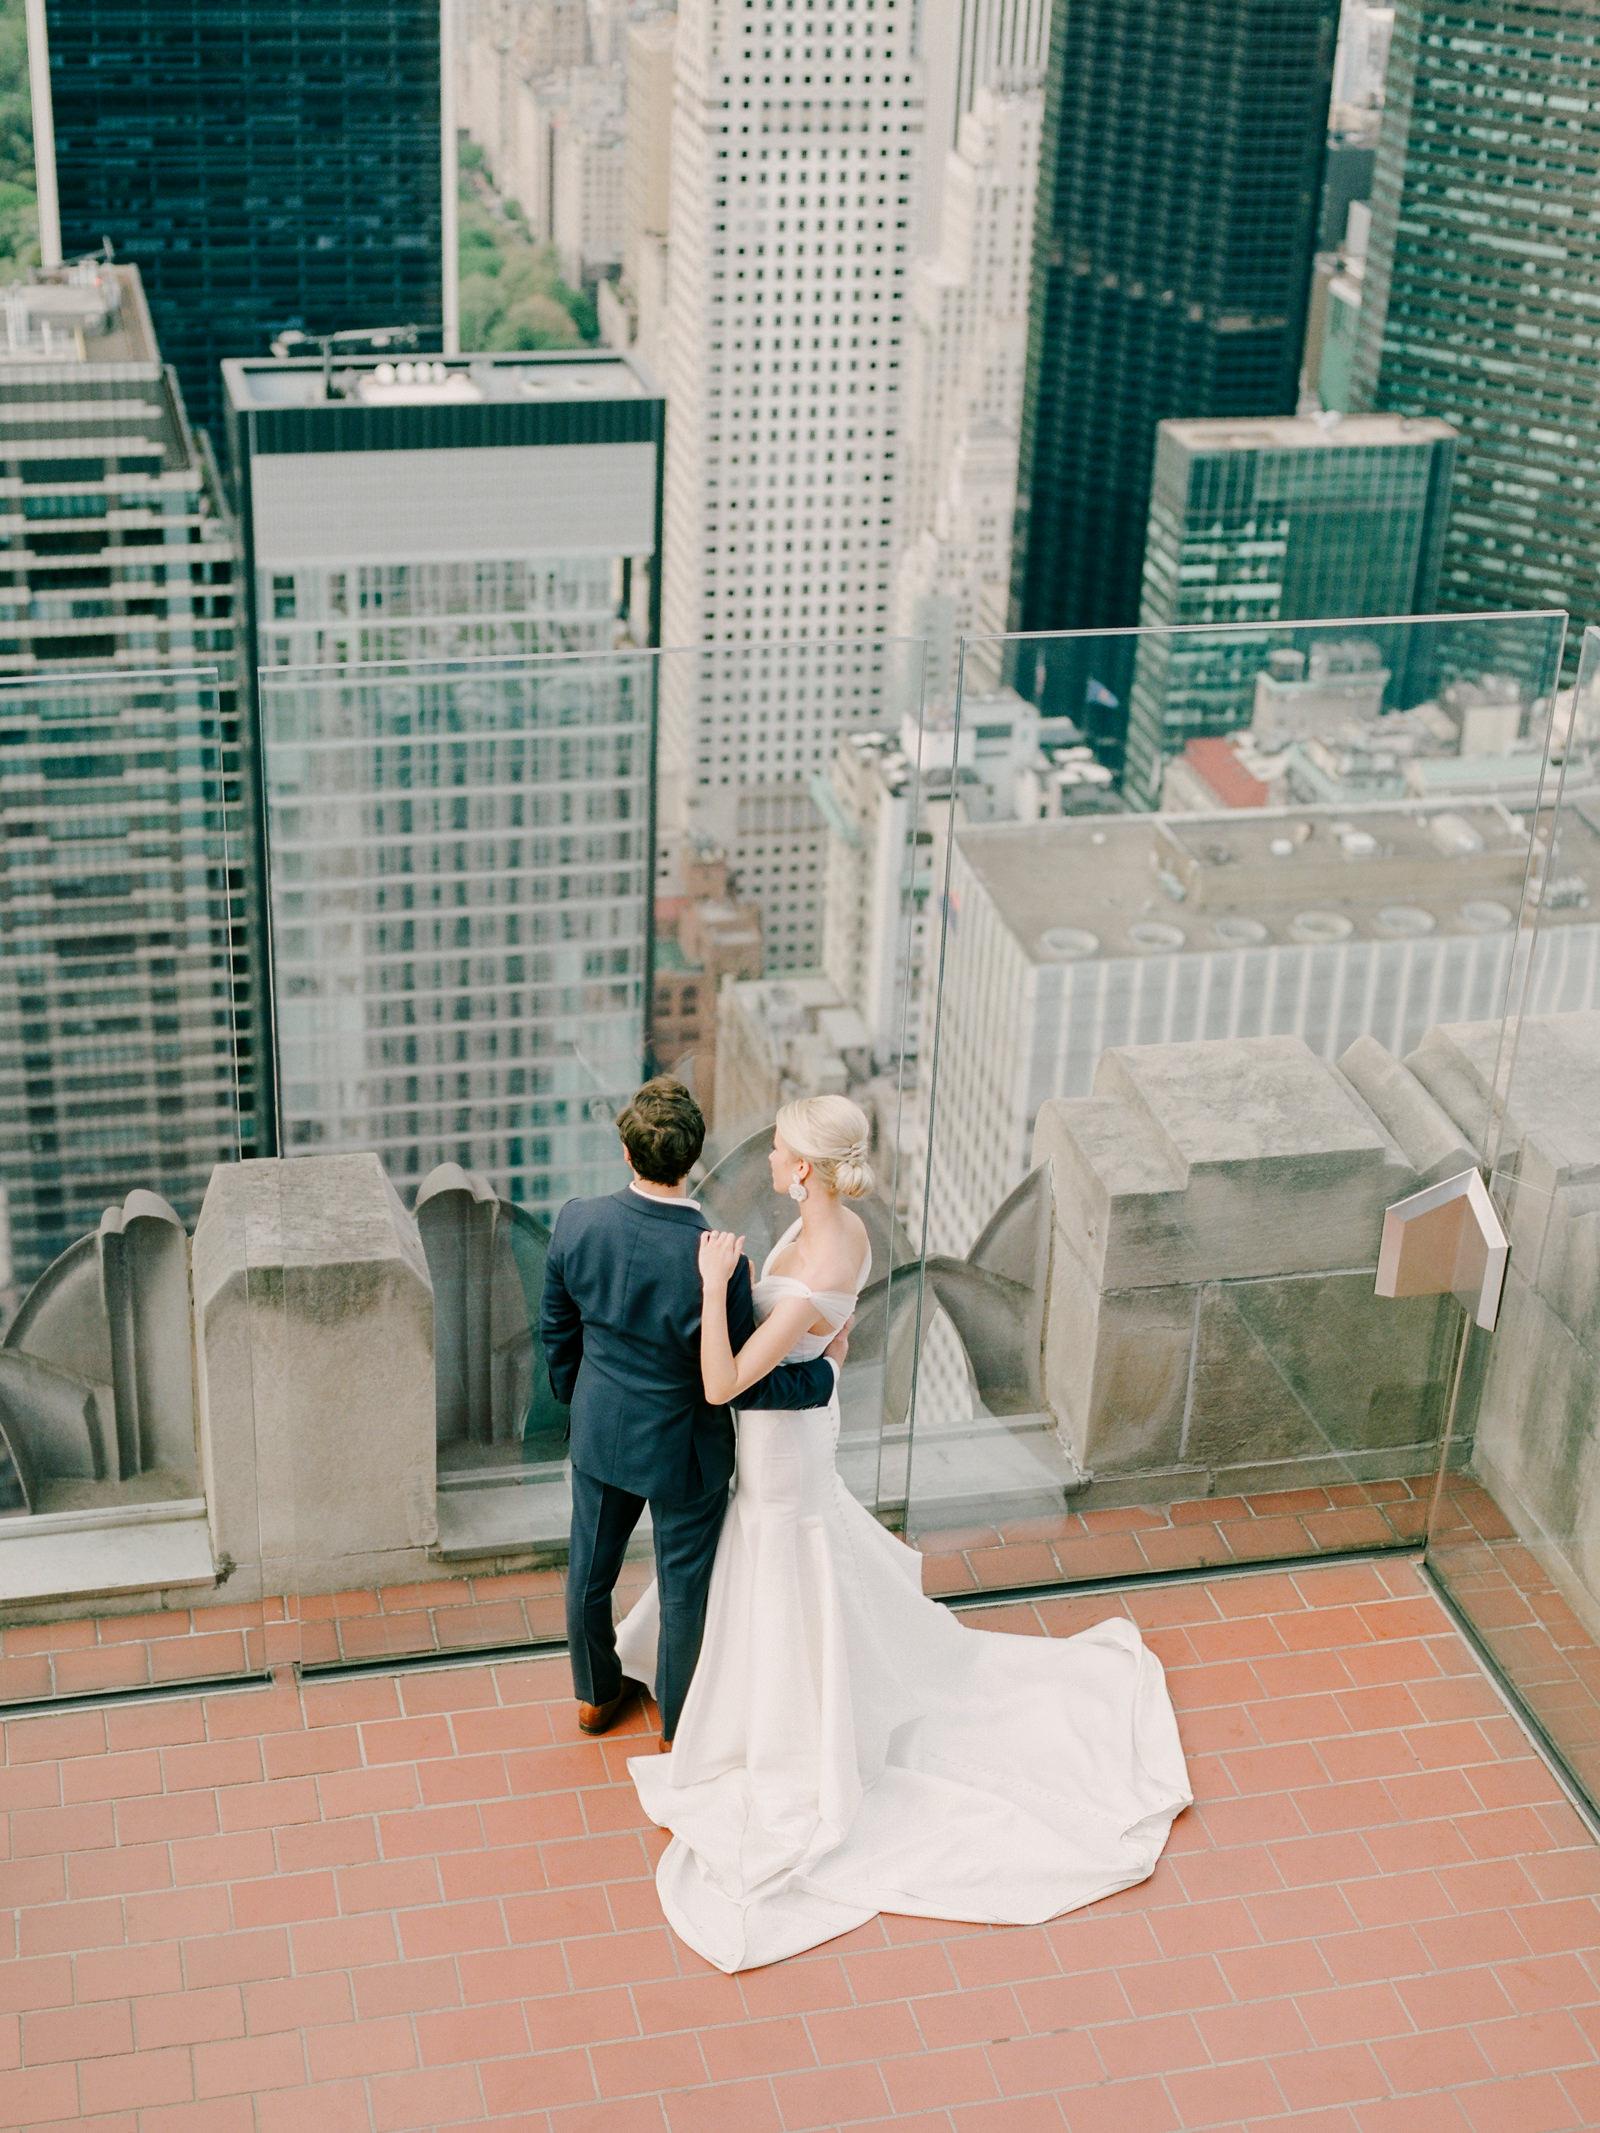 Intimate-NYC_wedding_ by Tanya Isaeva-163.jpg